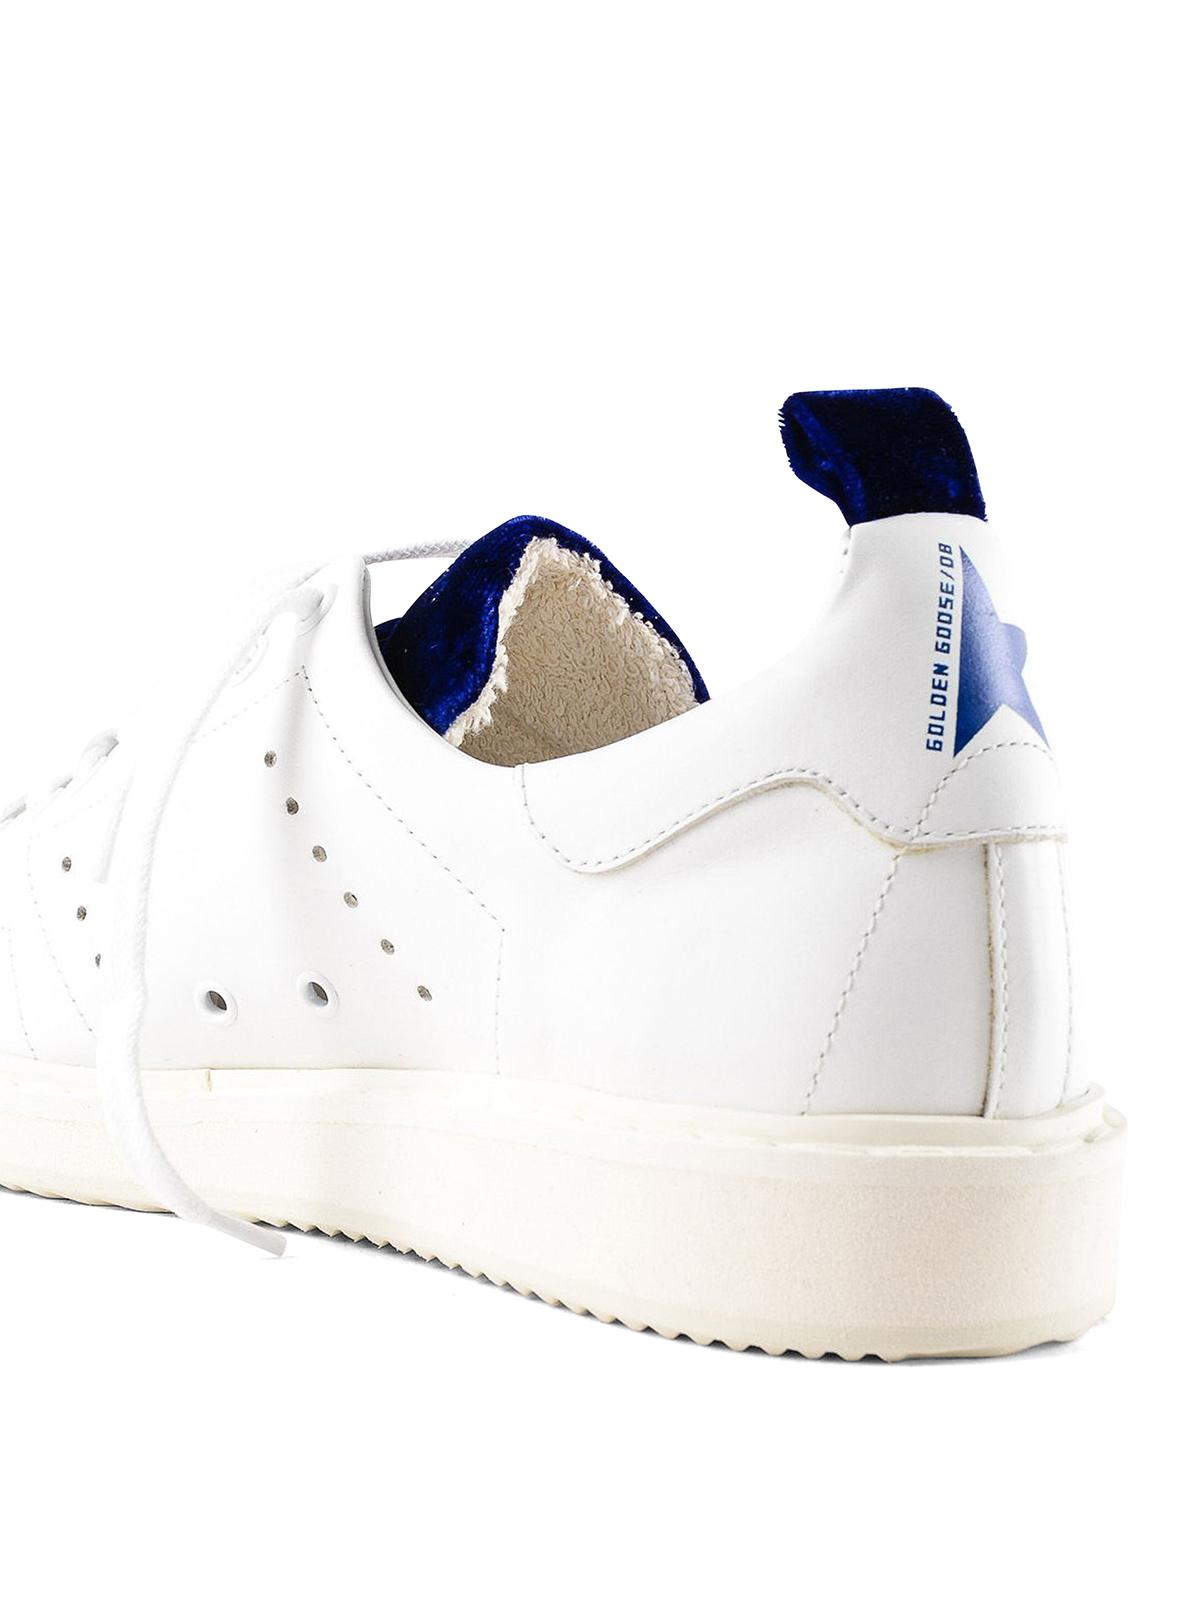 Golden Goose - Starter sneakers with